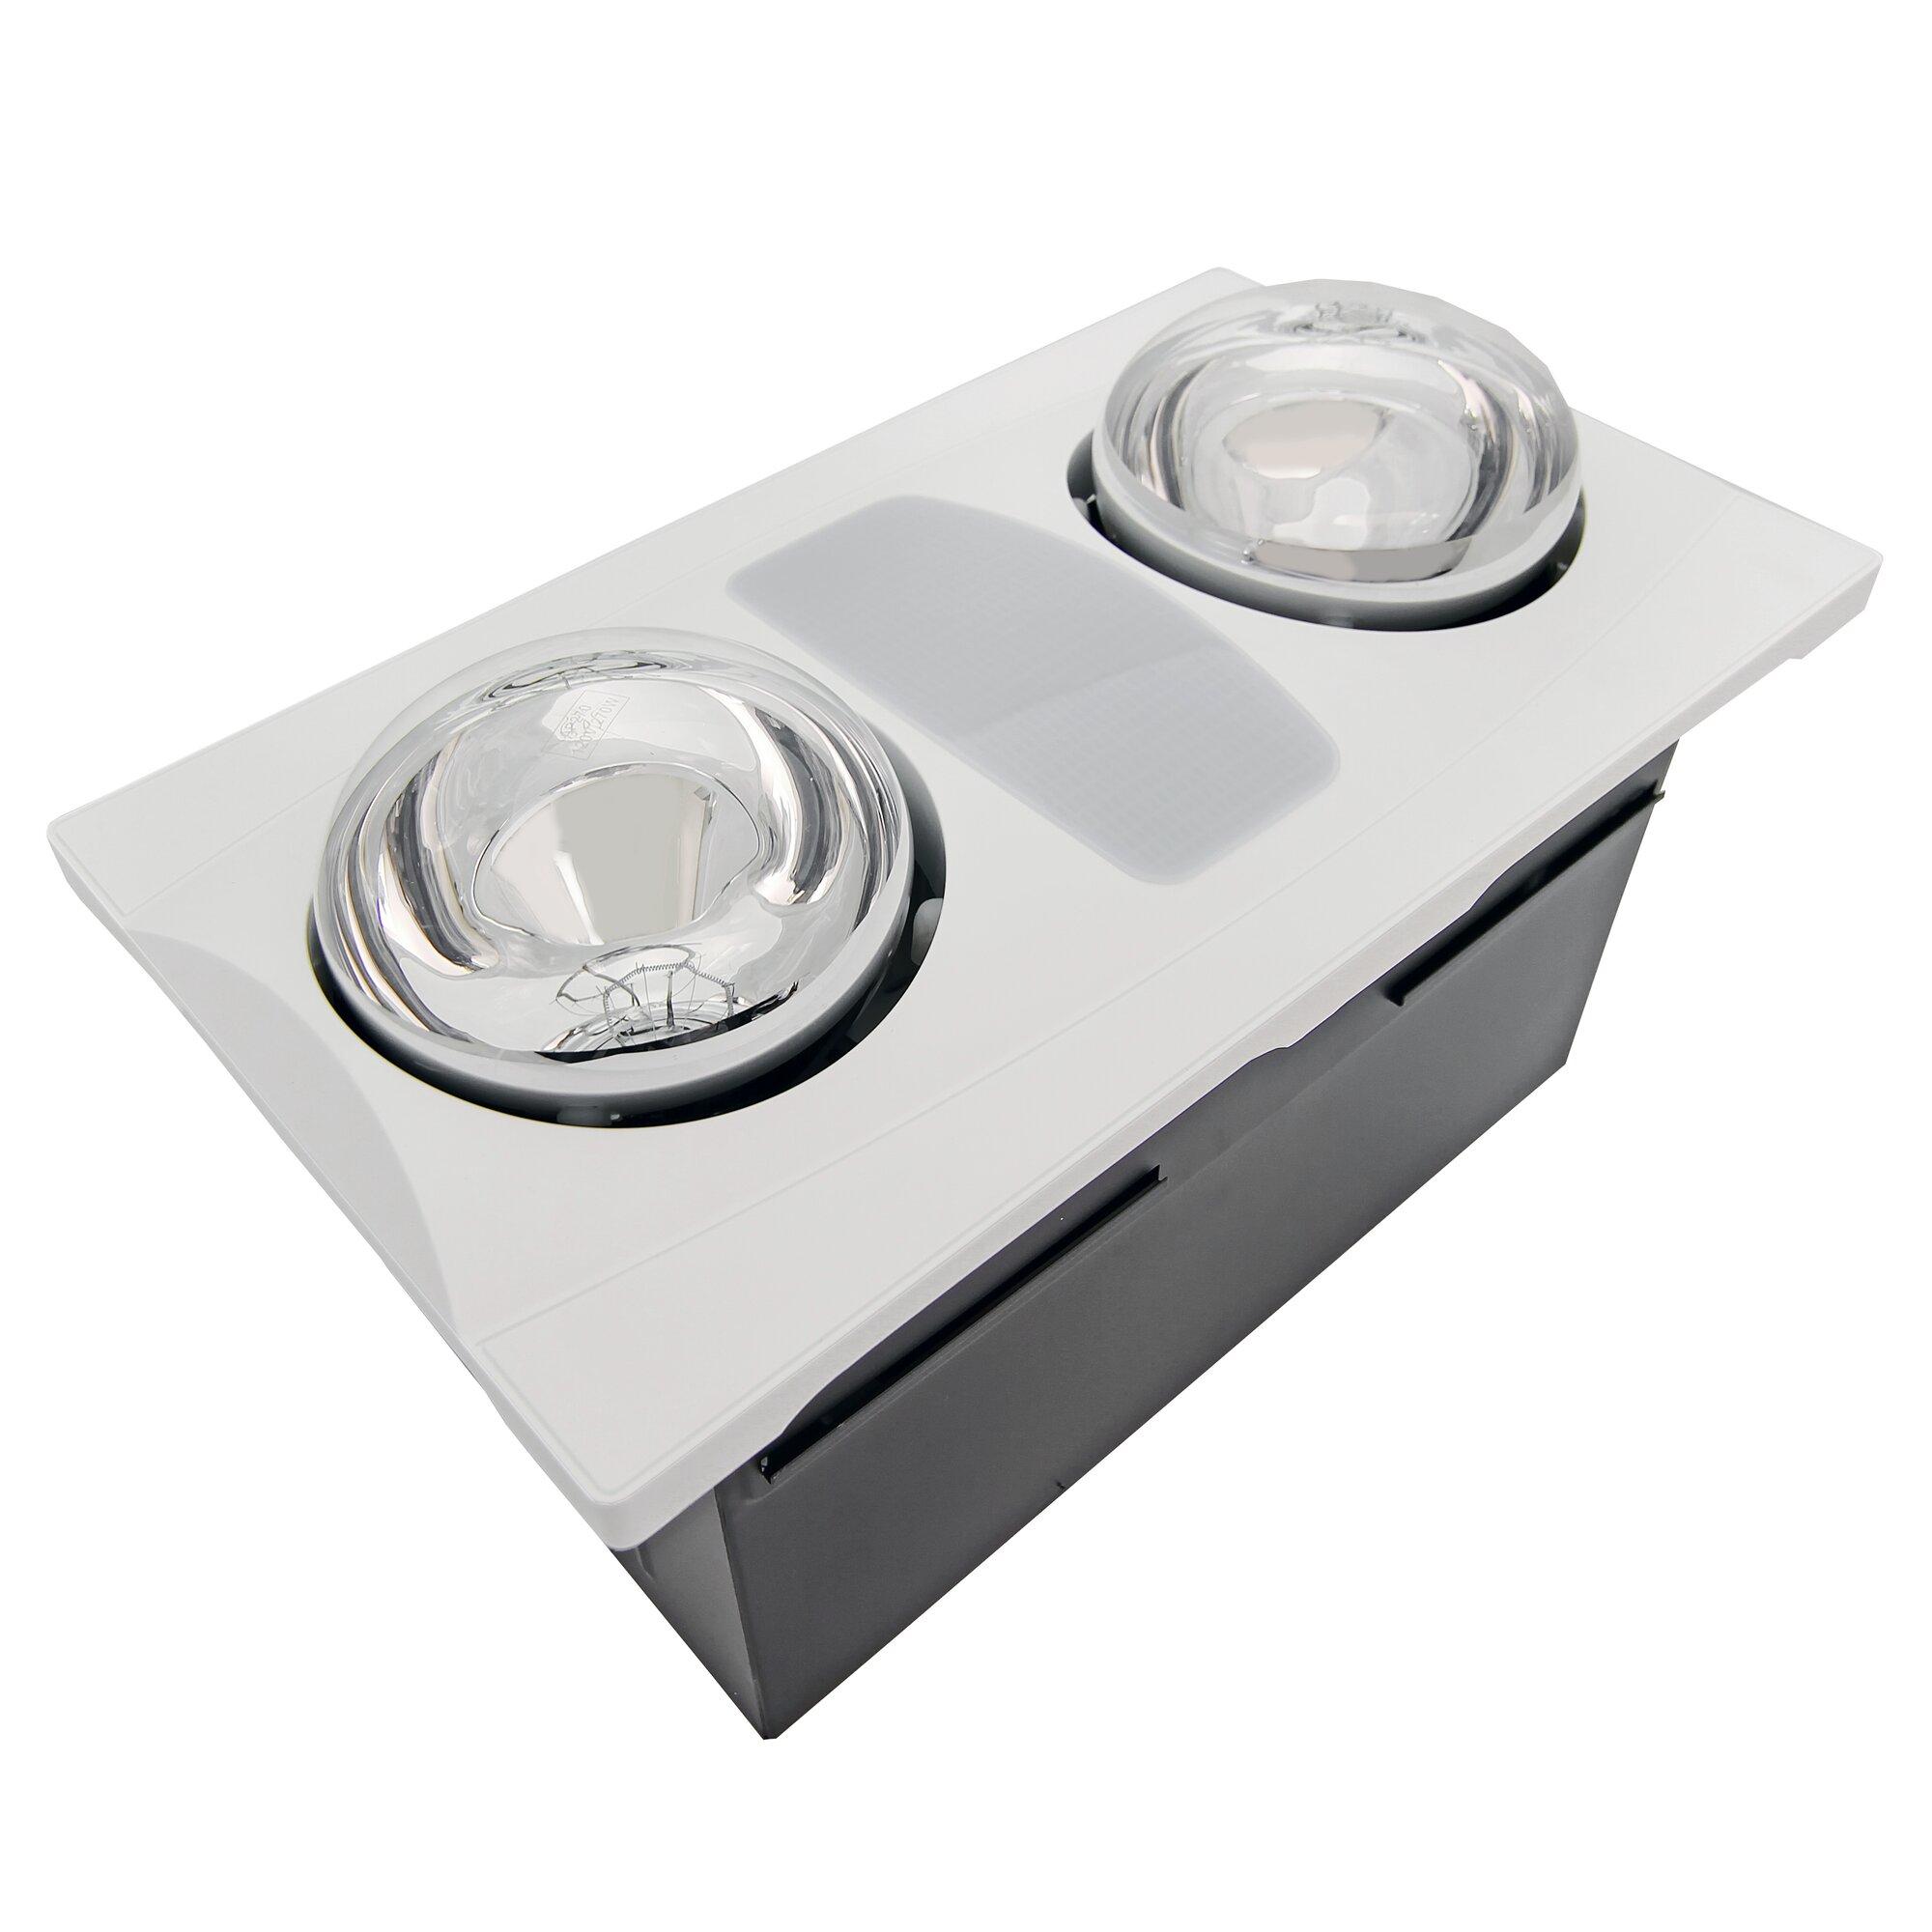 Bathroom heaters ceiling - 80 Cfm Bathroom Fan With Heater And Light